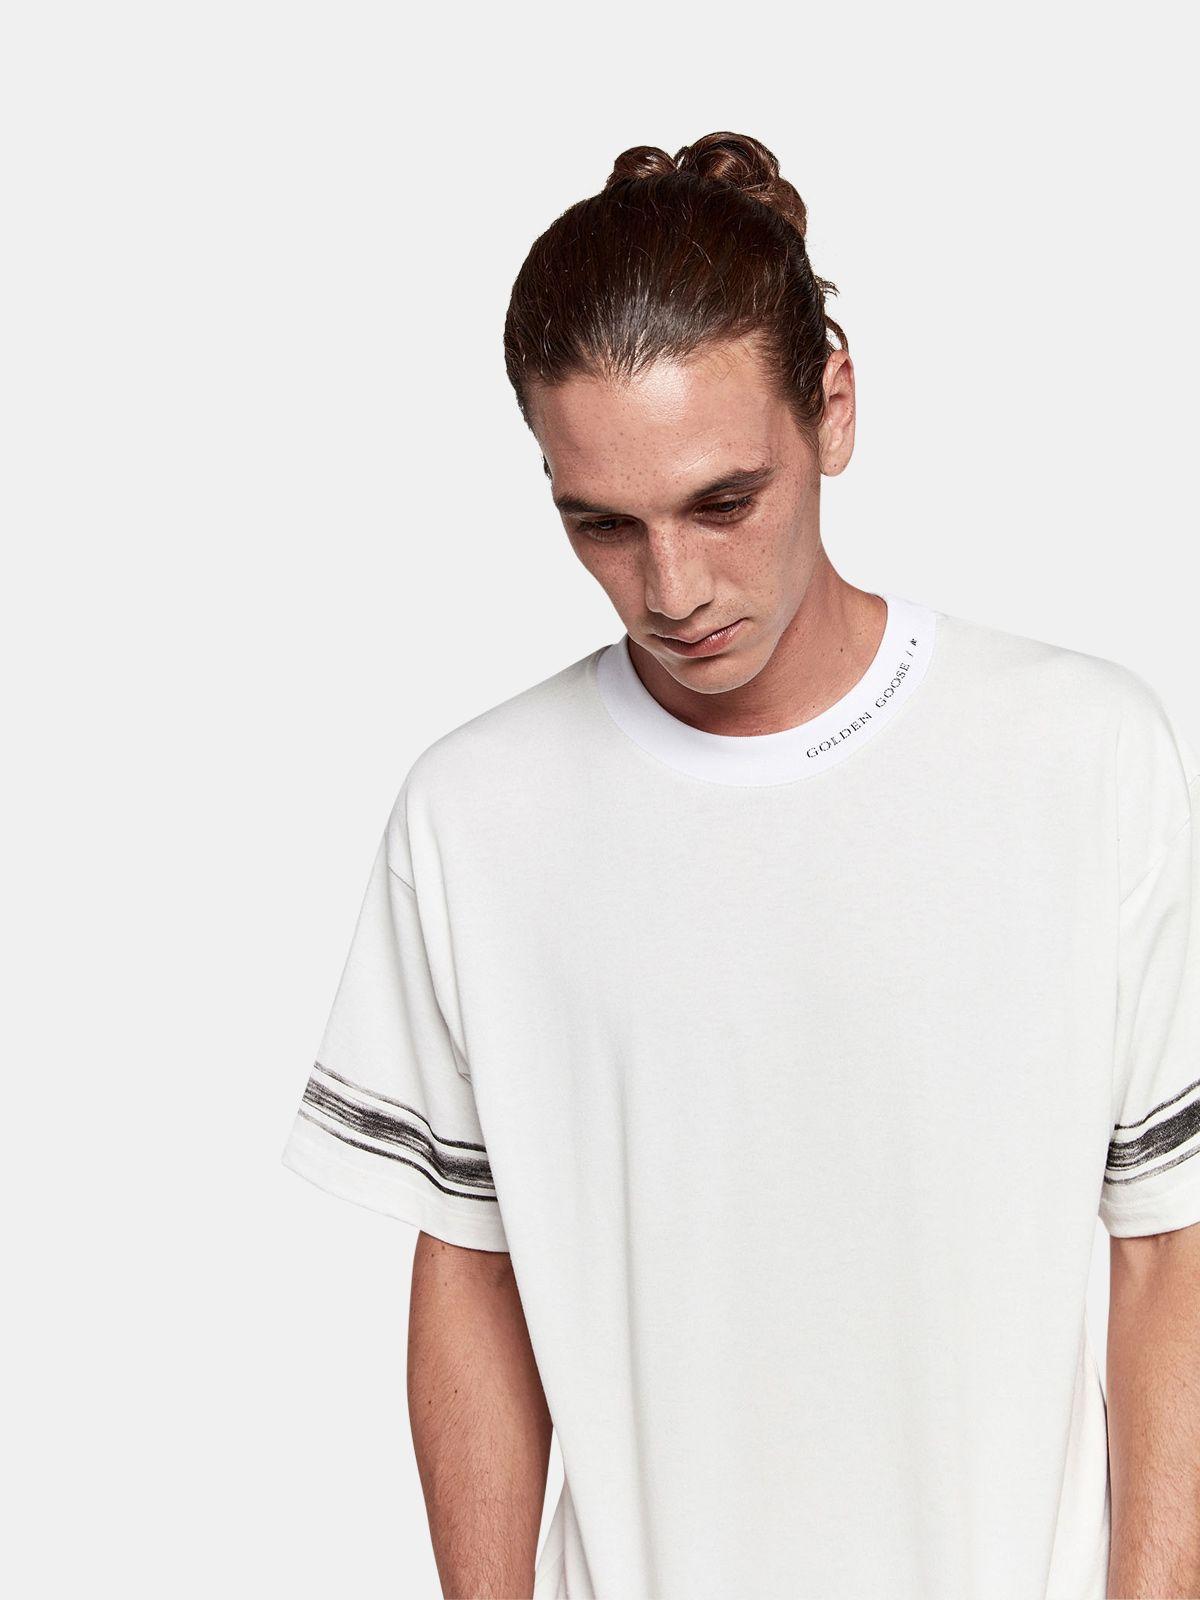 Golden Goose - T-shirt Ryo en jersey de coton avec logo et rayures contrastées in